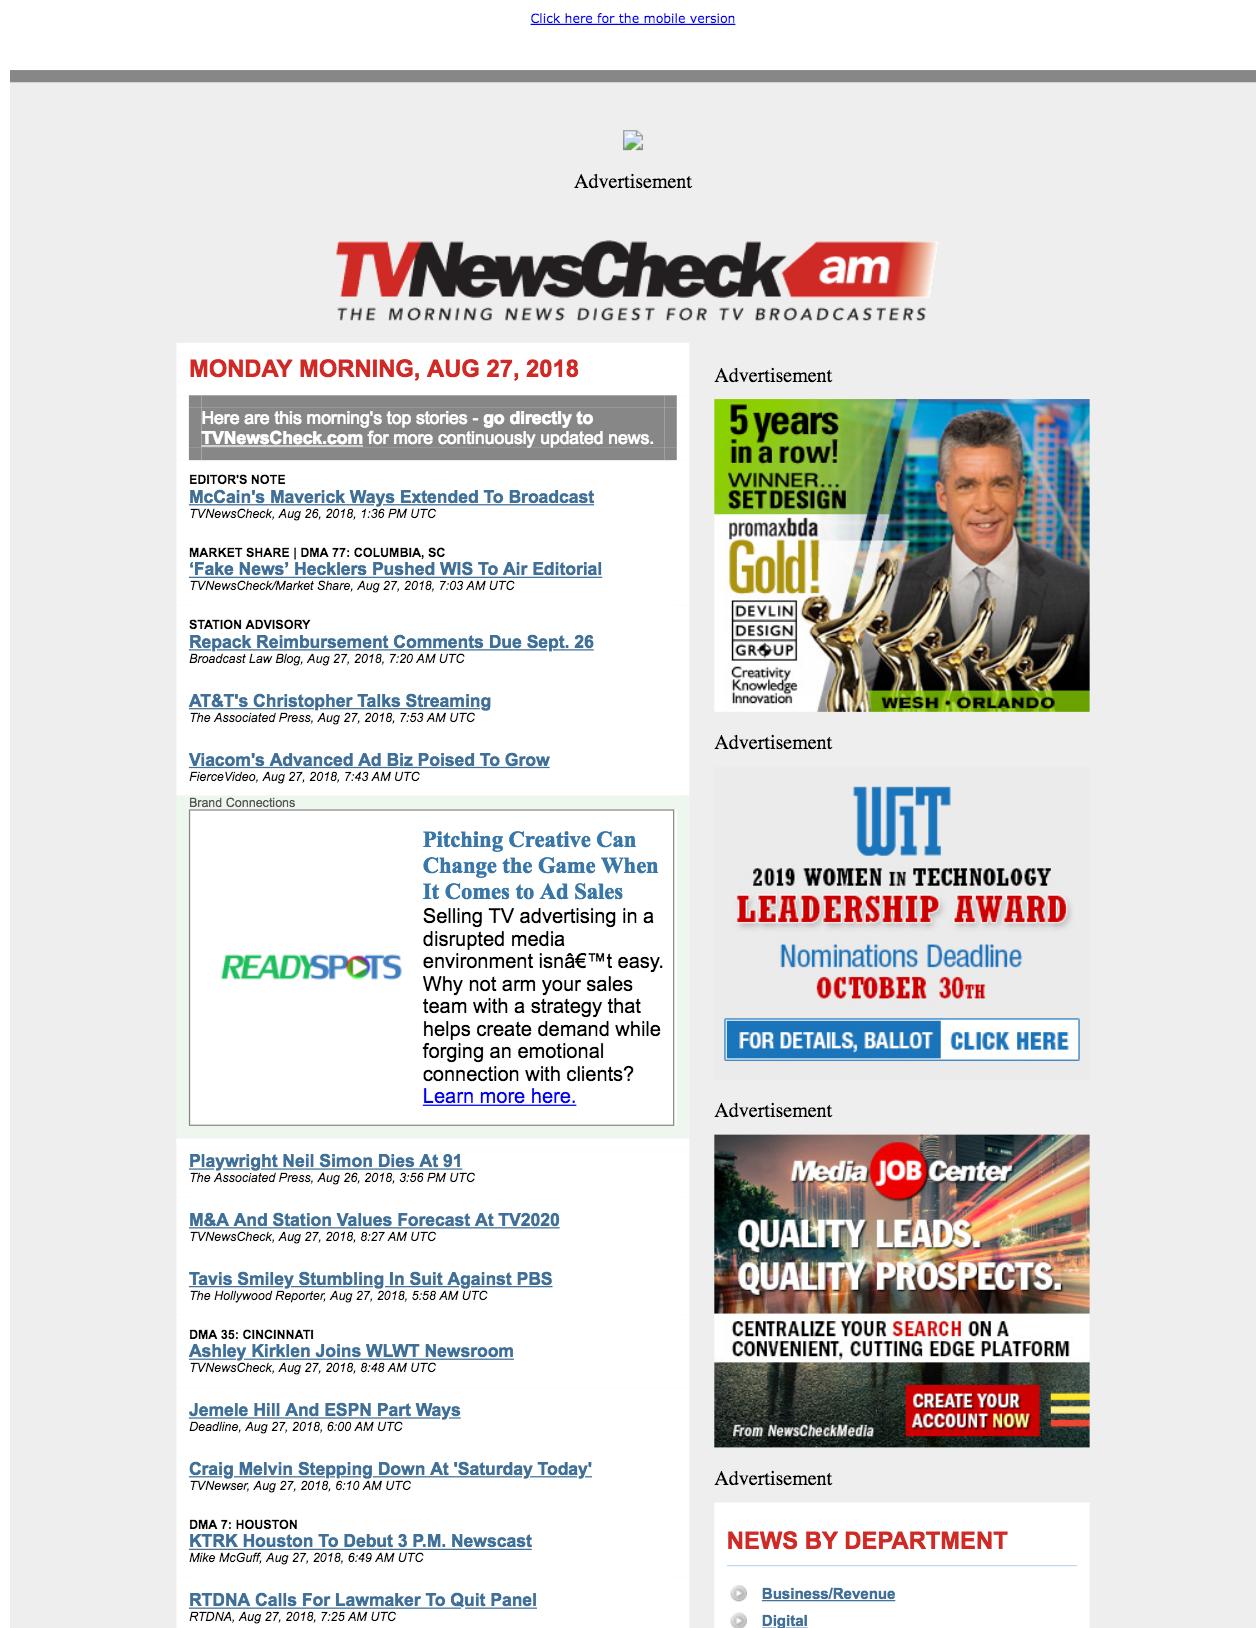 TVNewcheck AM